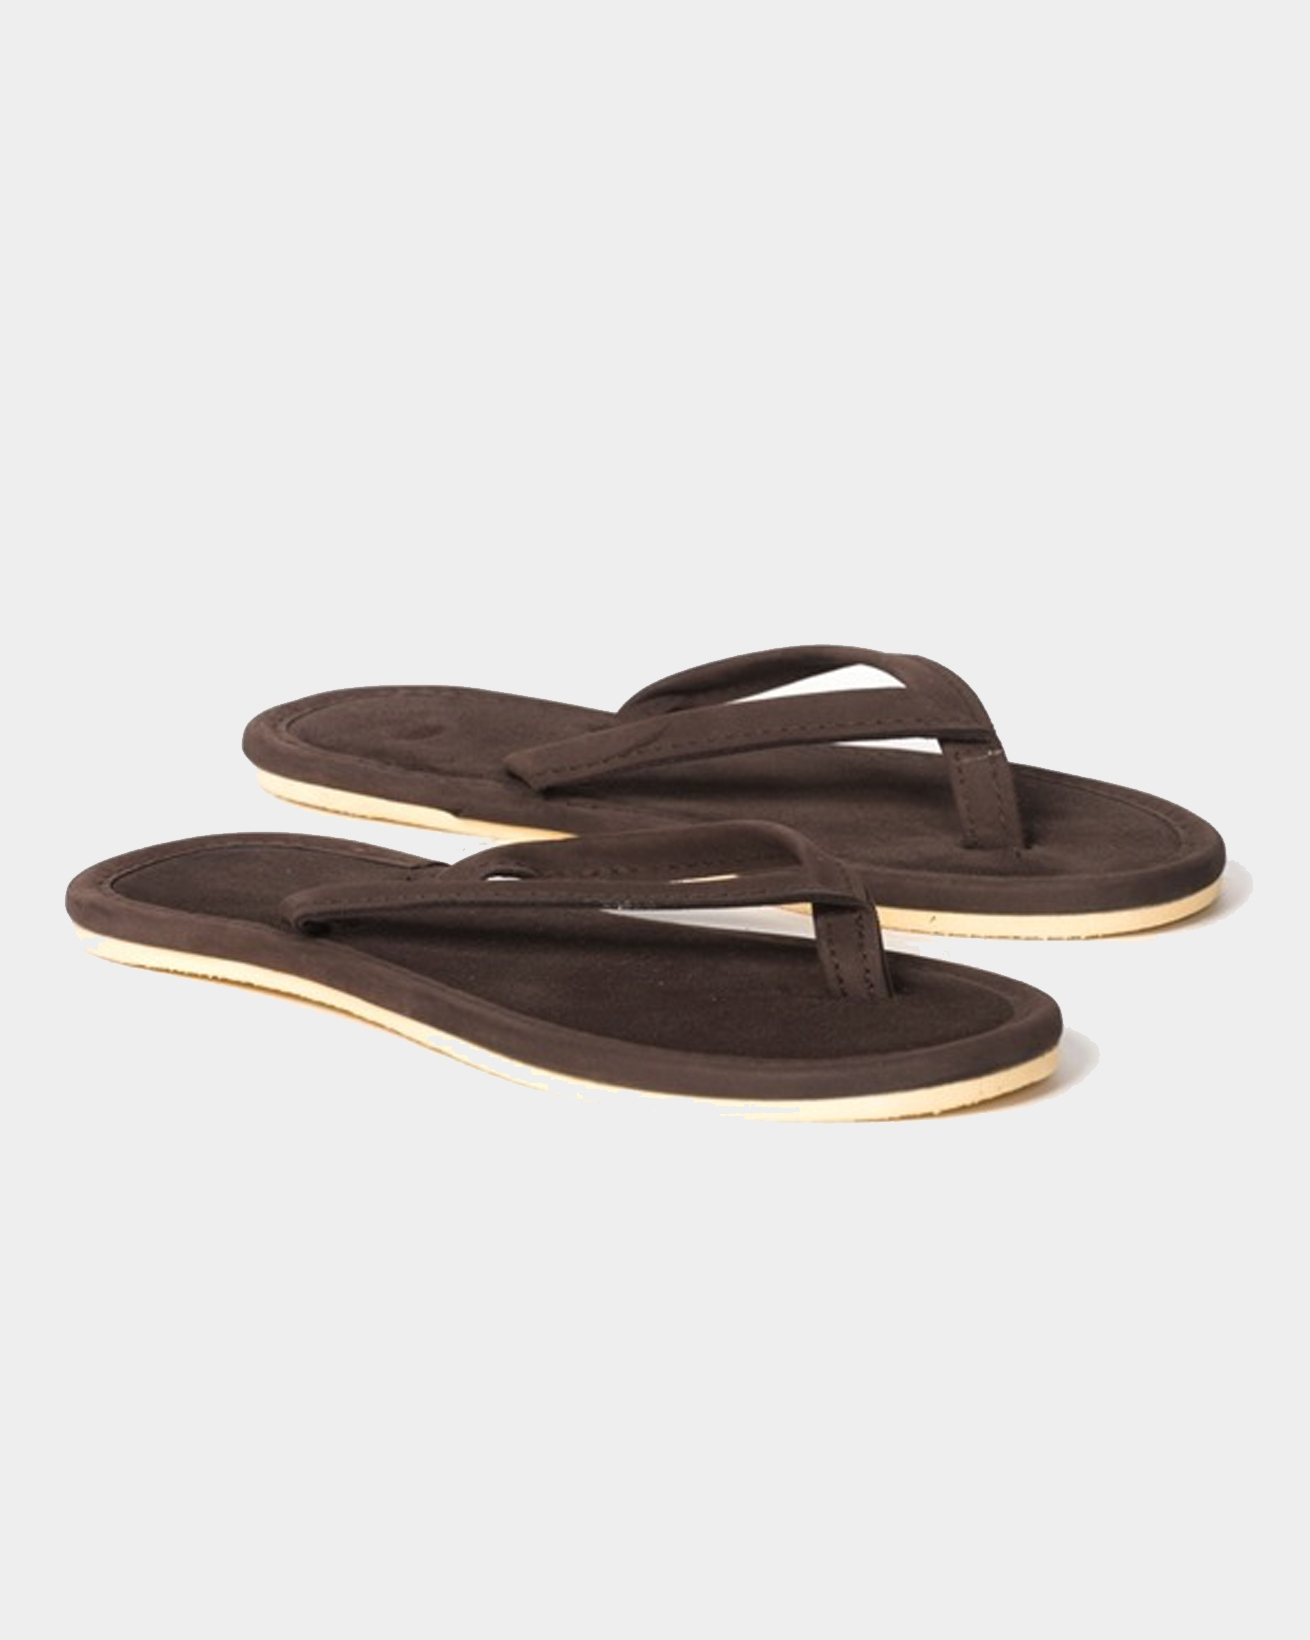 2501-nubuck-suede-flip-flops-mocca-1.jpg